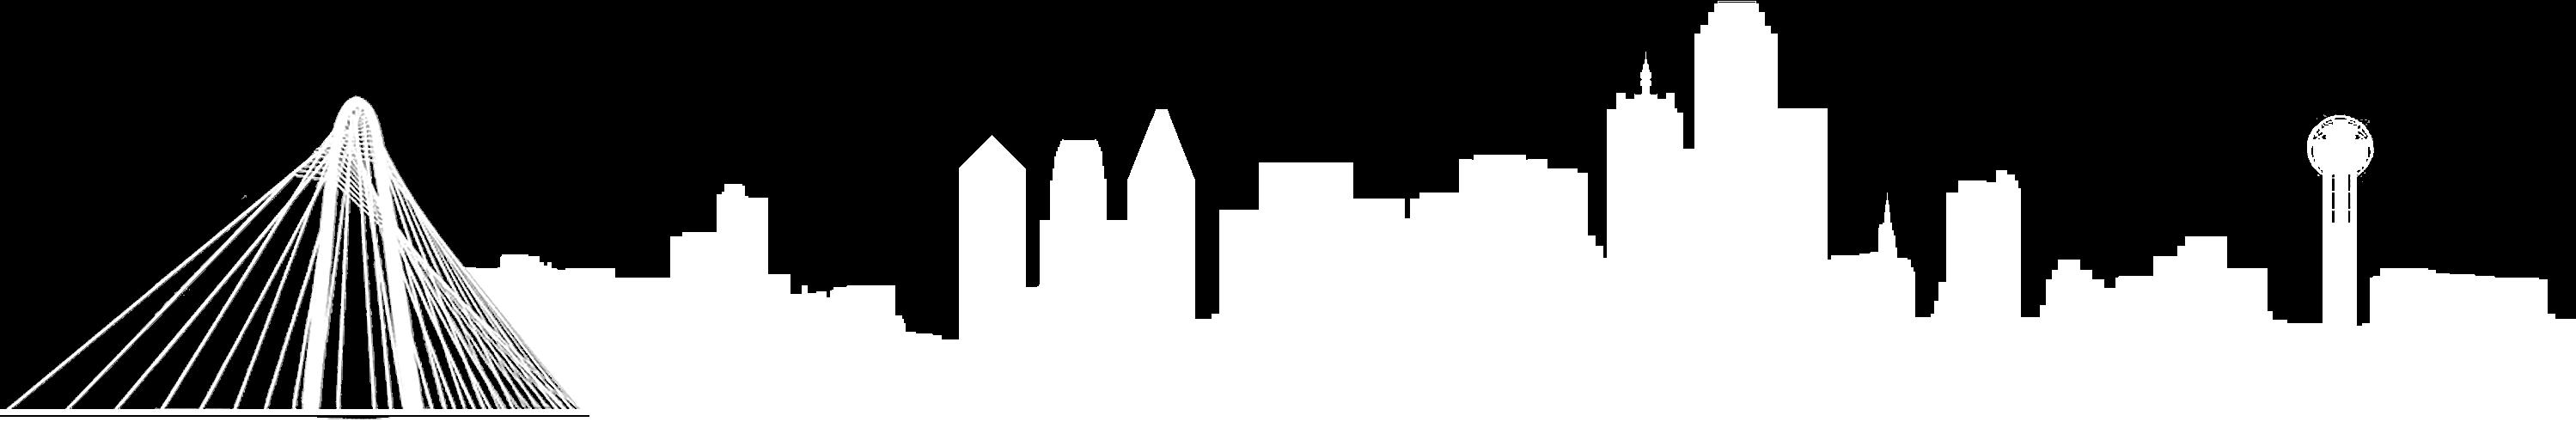 Dallas Skyline W